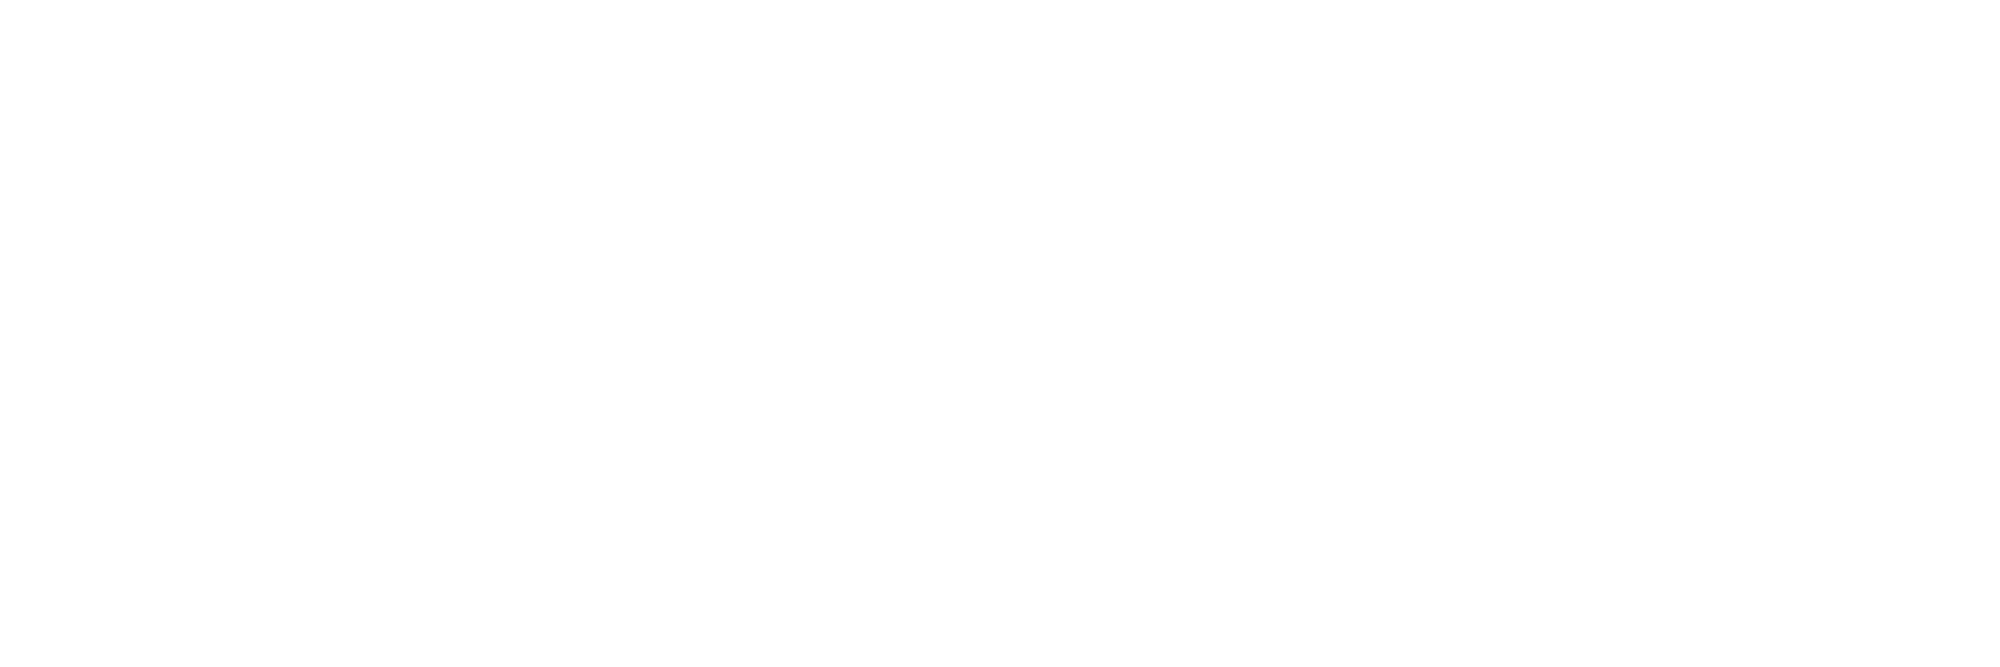 tmp 9632 12 5 2019 110905